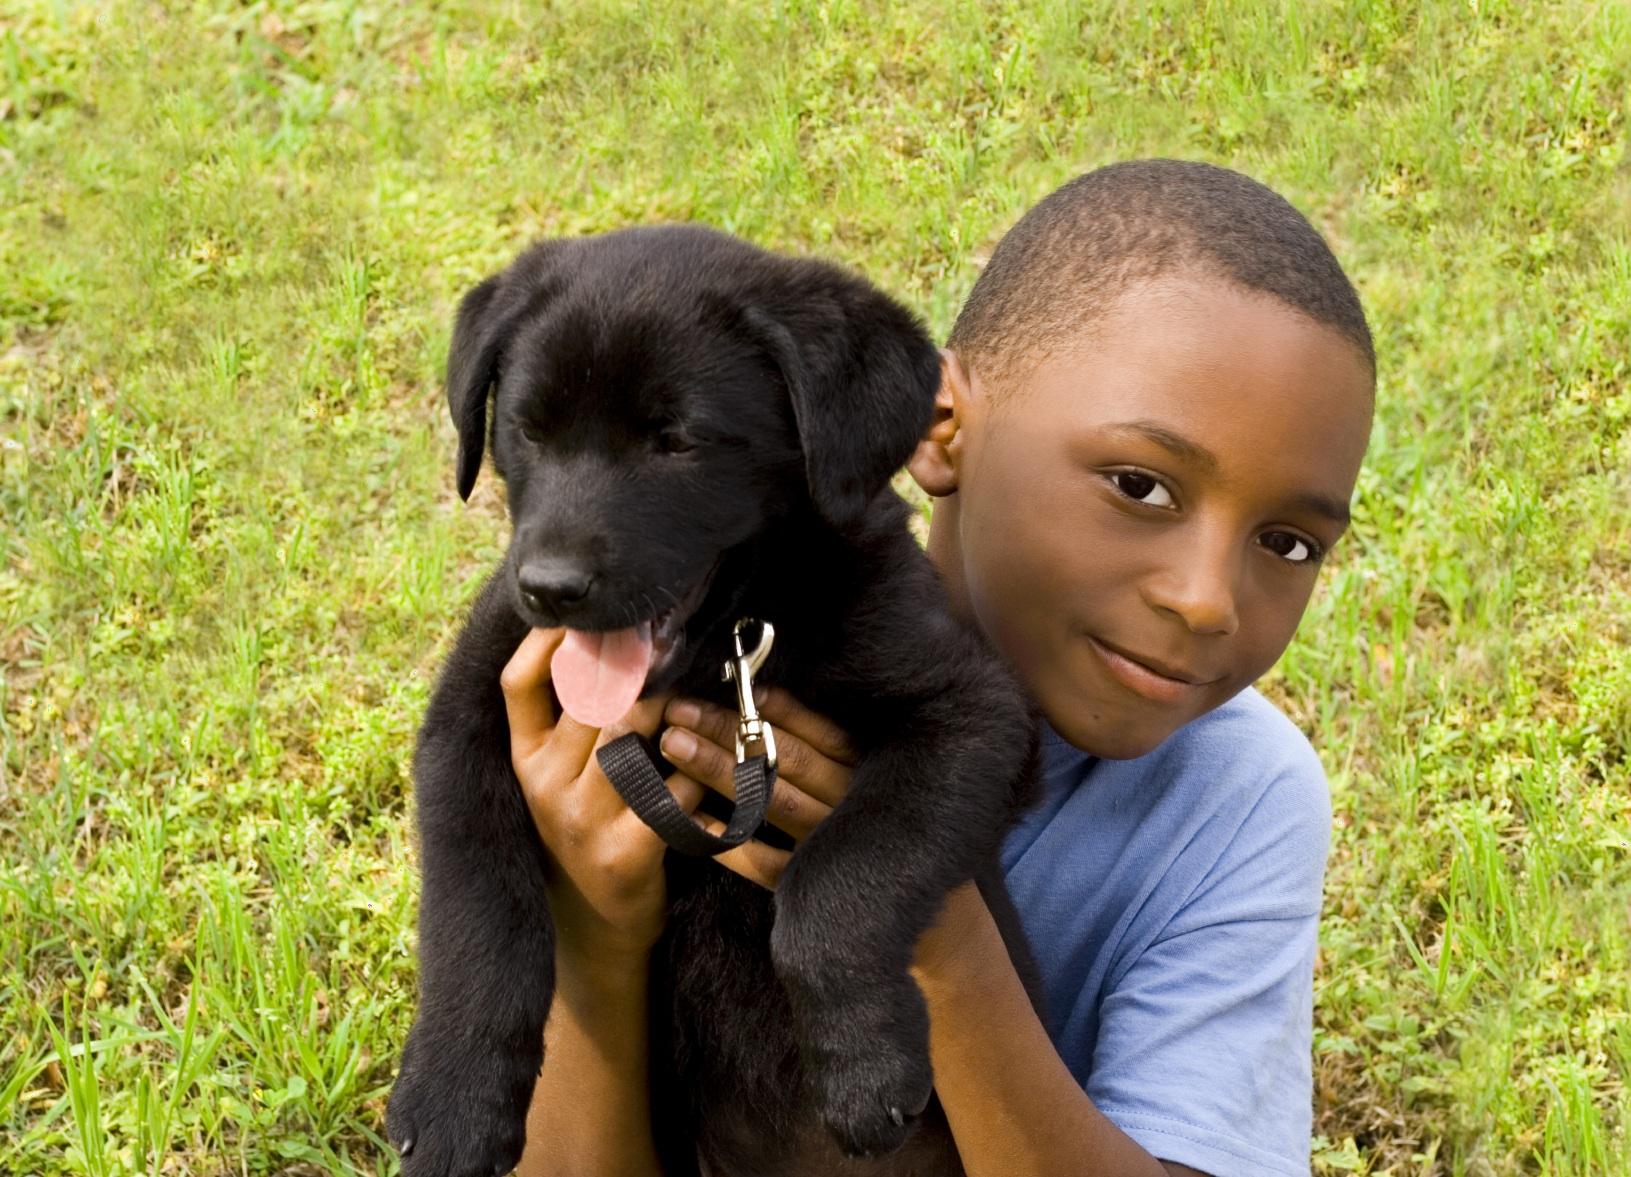 Pup-A-Palooza at Houston's Meadowlake Pet Resort